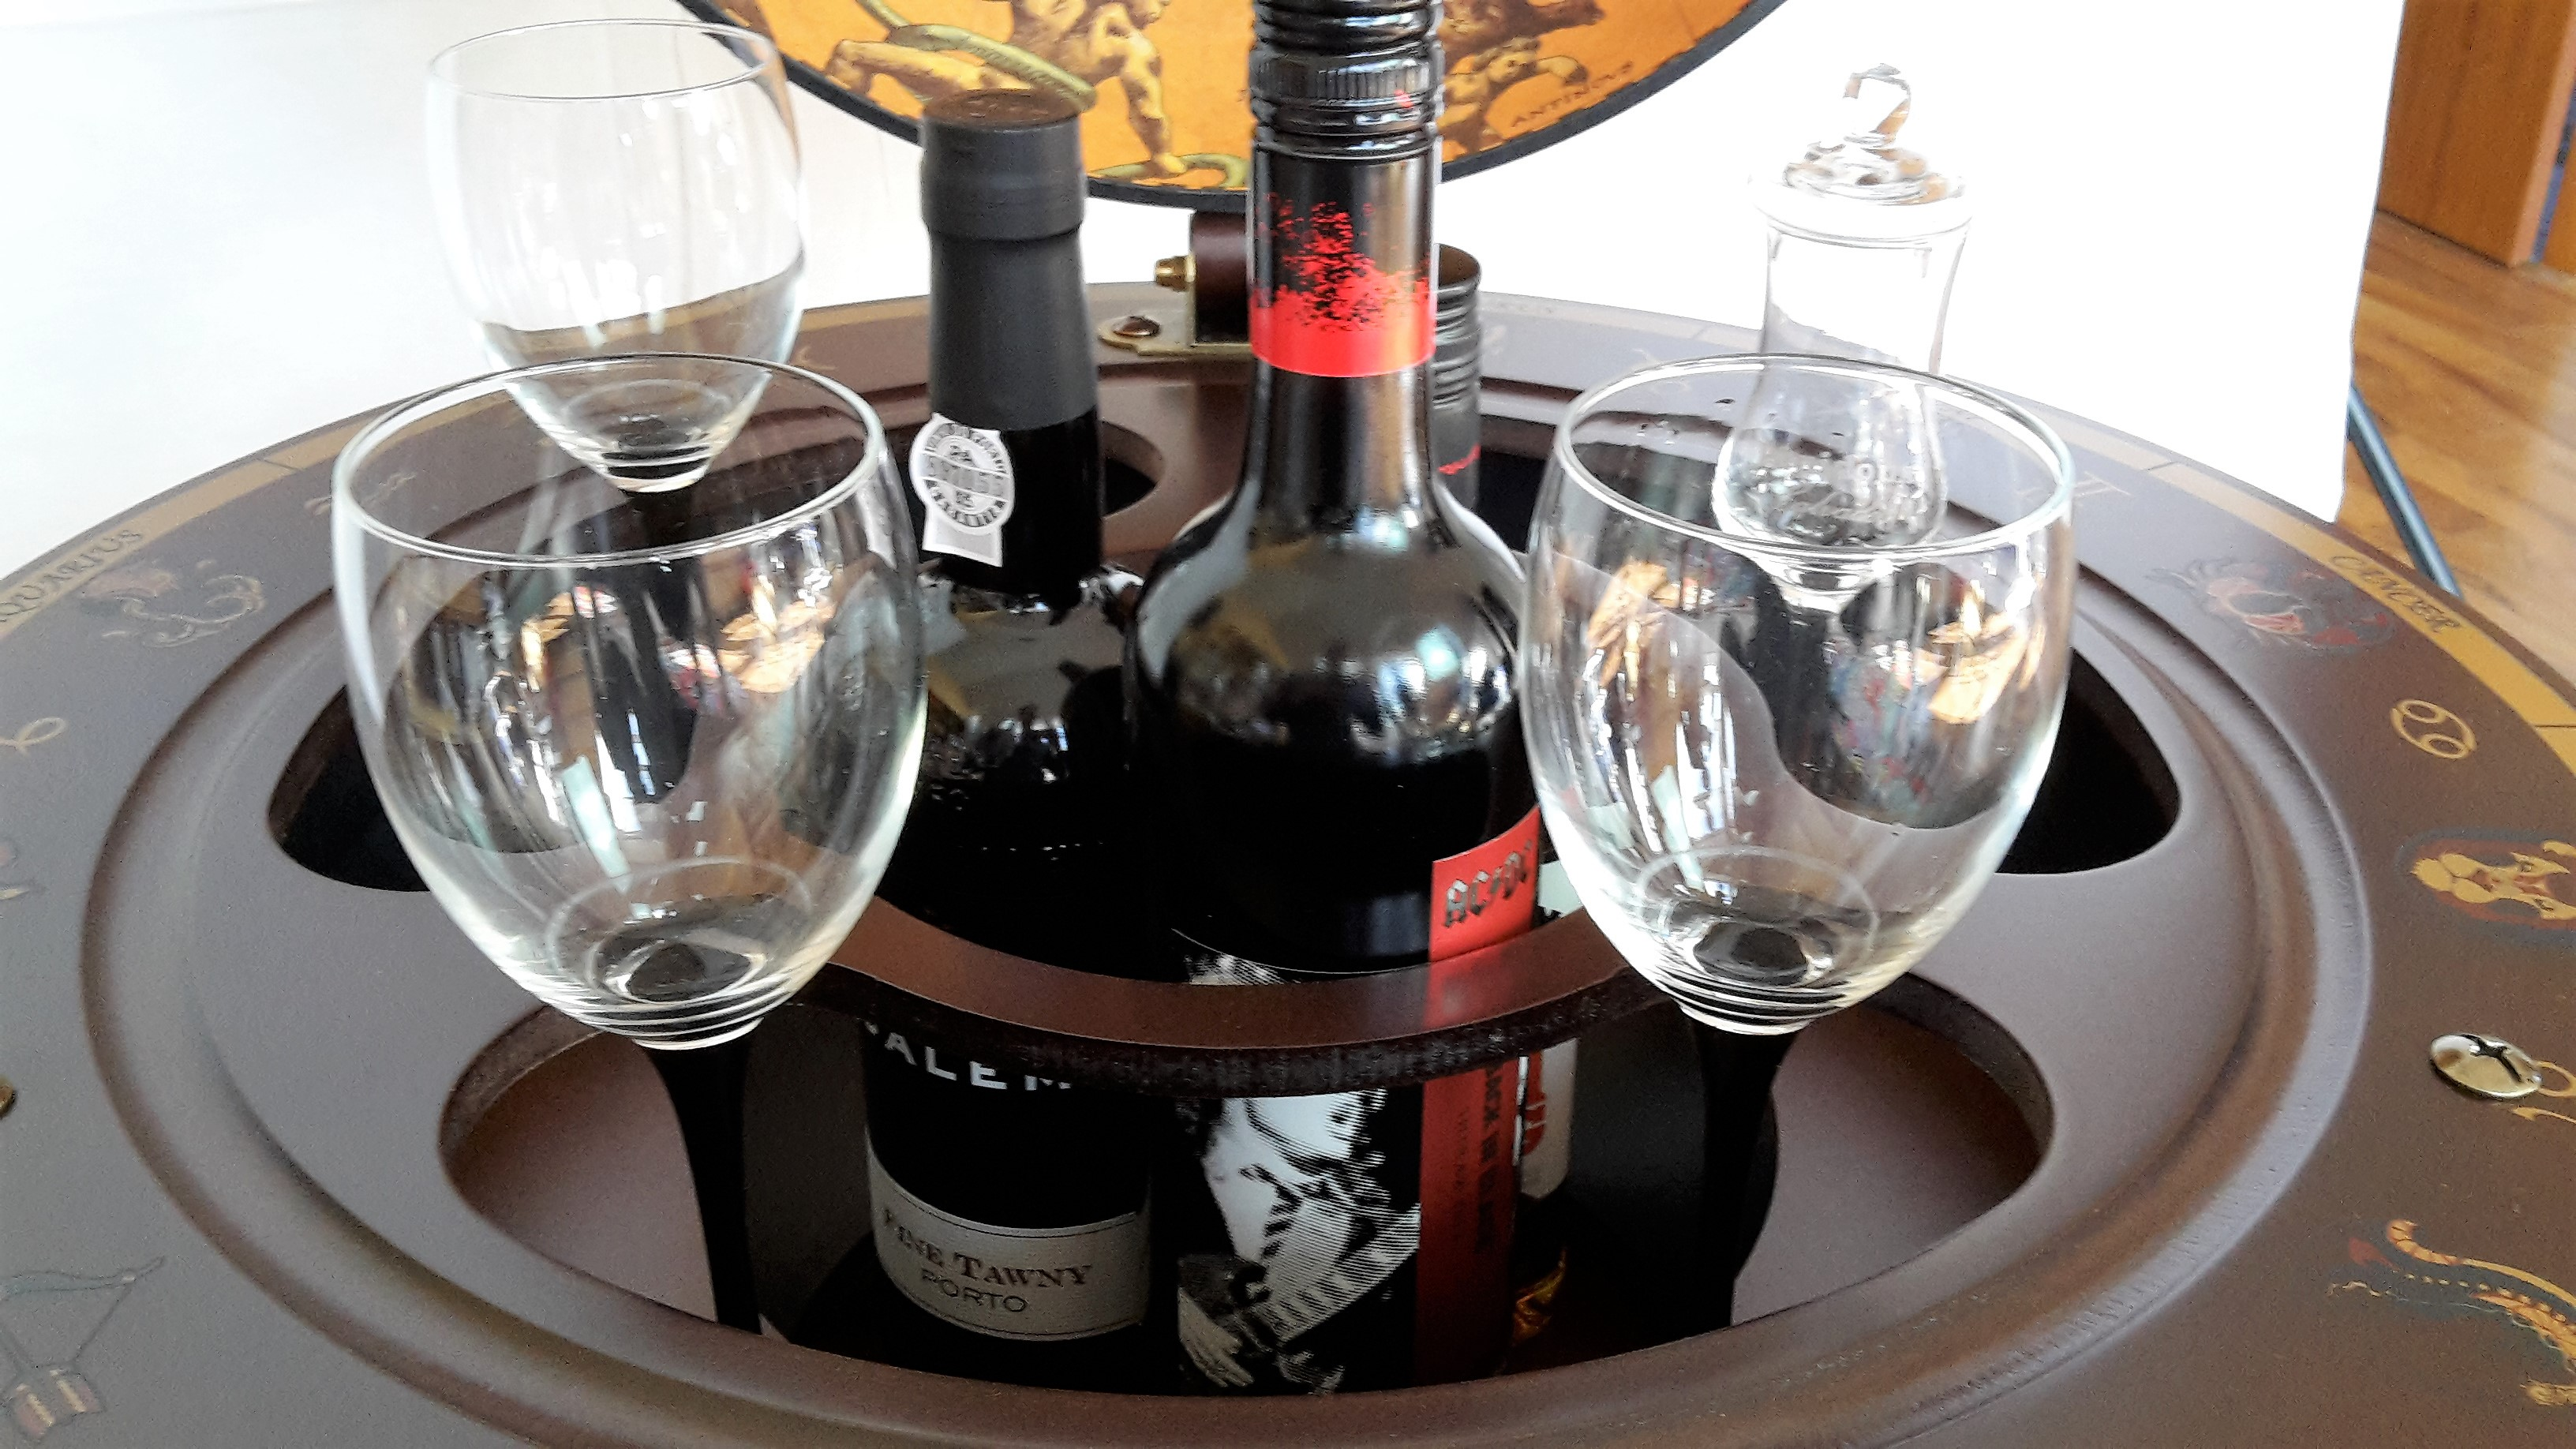 Globus Bar Minibar Enea Zoffoli Innenraum Flaschen Gläser Minibar Barwagen 2